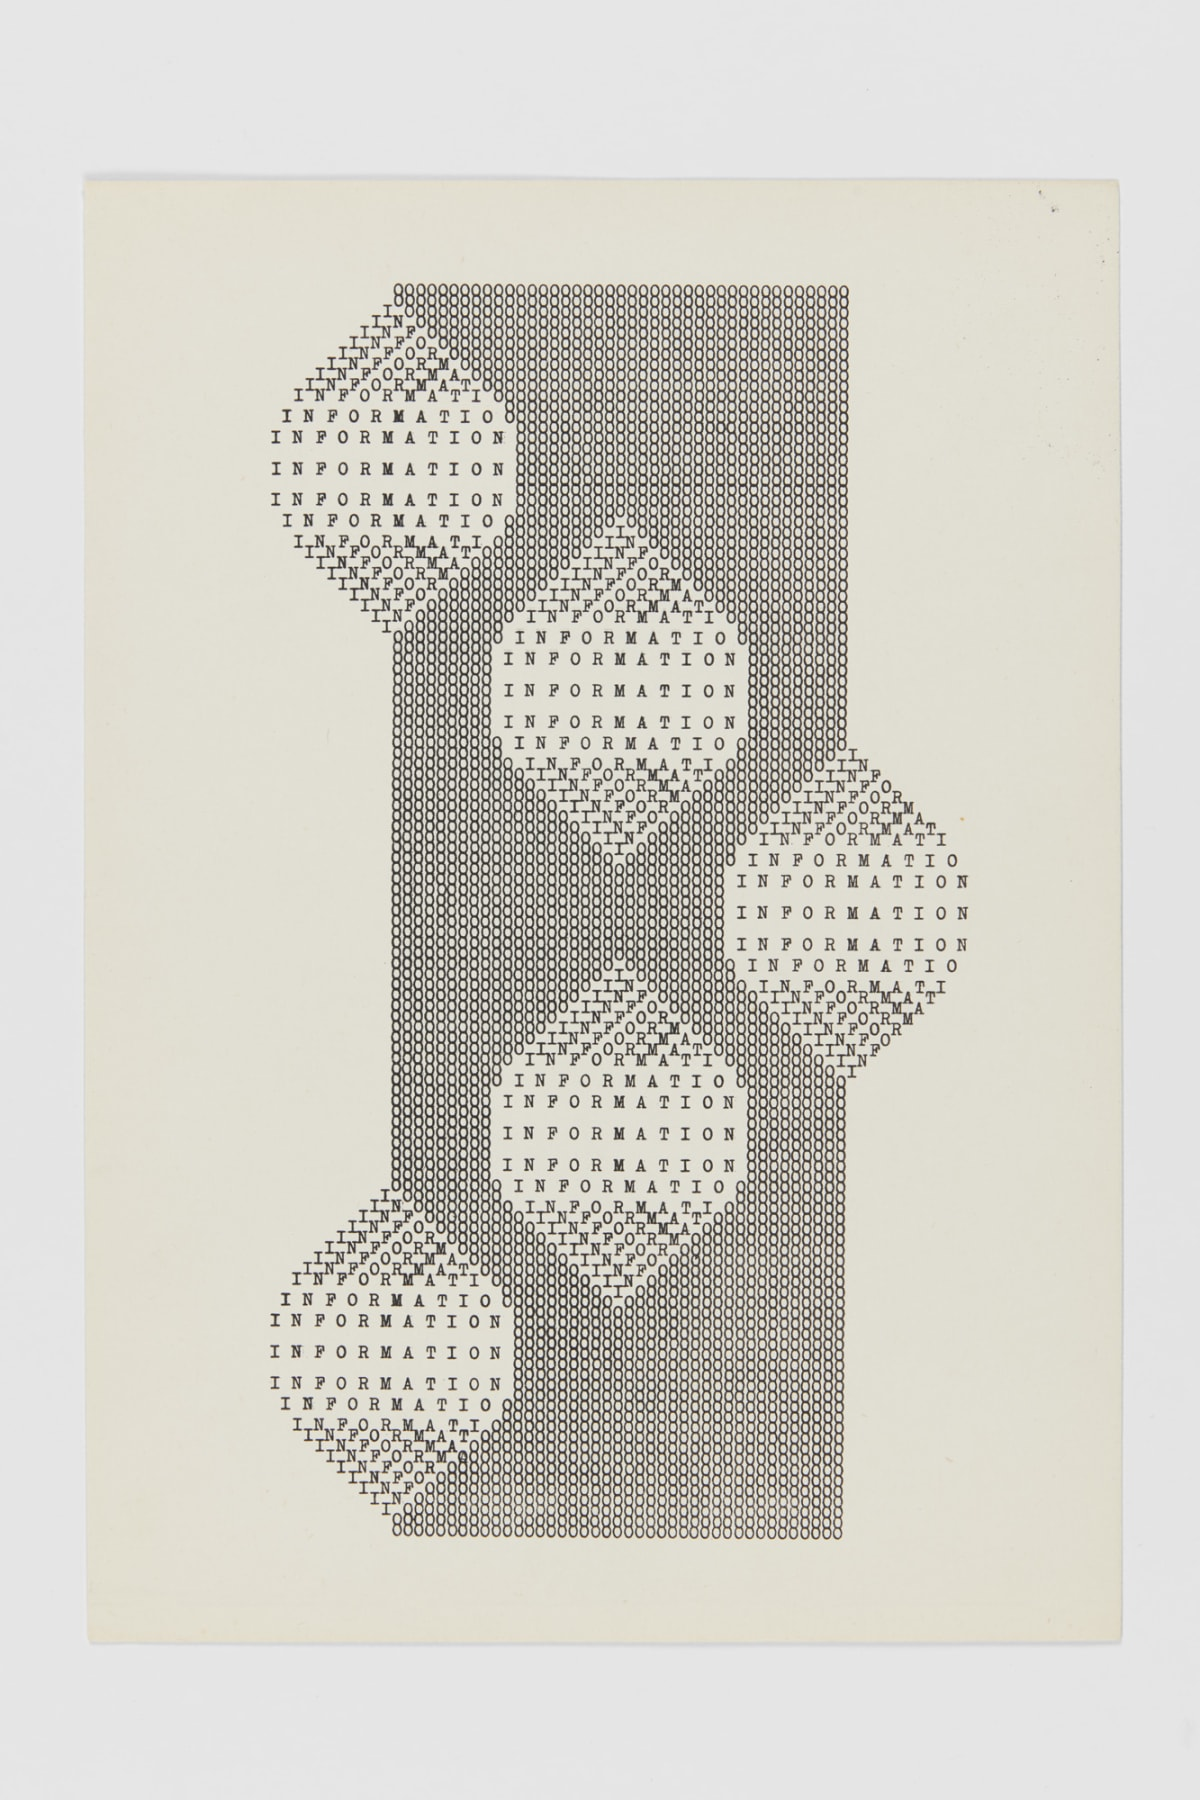 Ruth WOLF-REHFELDT Information Bildung, c.1980 print (zinc lithograph) 29.9 x 21.1 cm